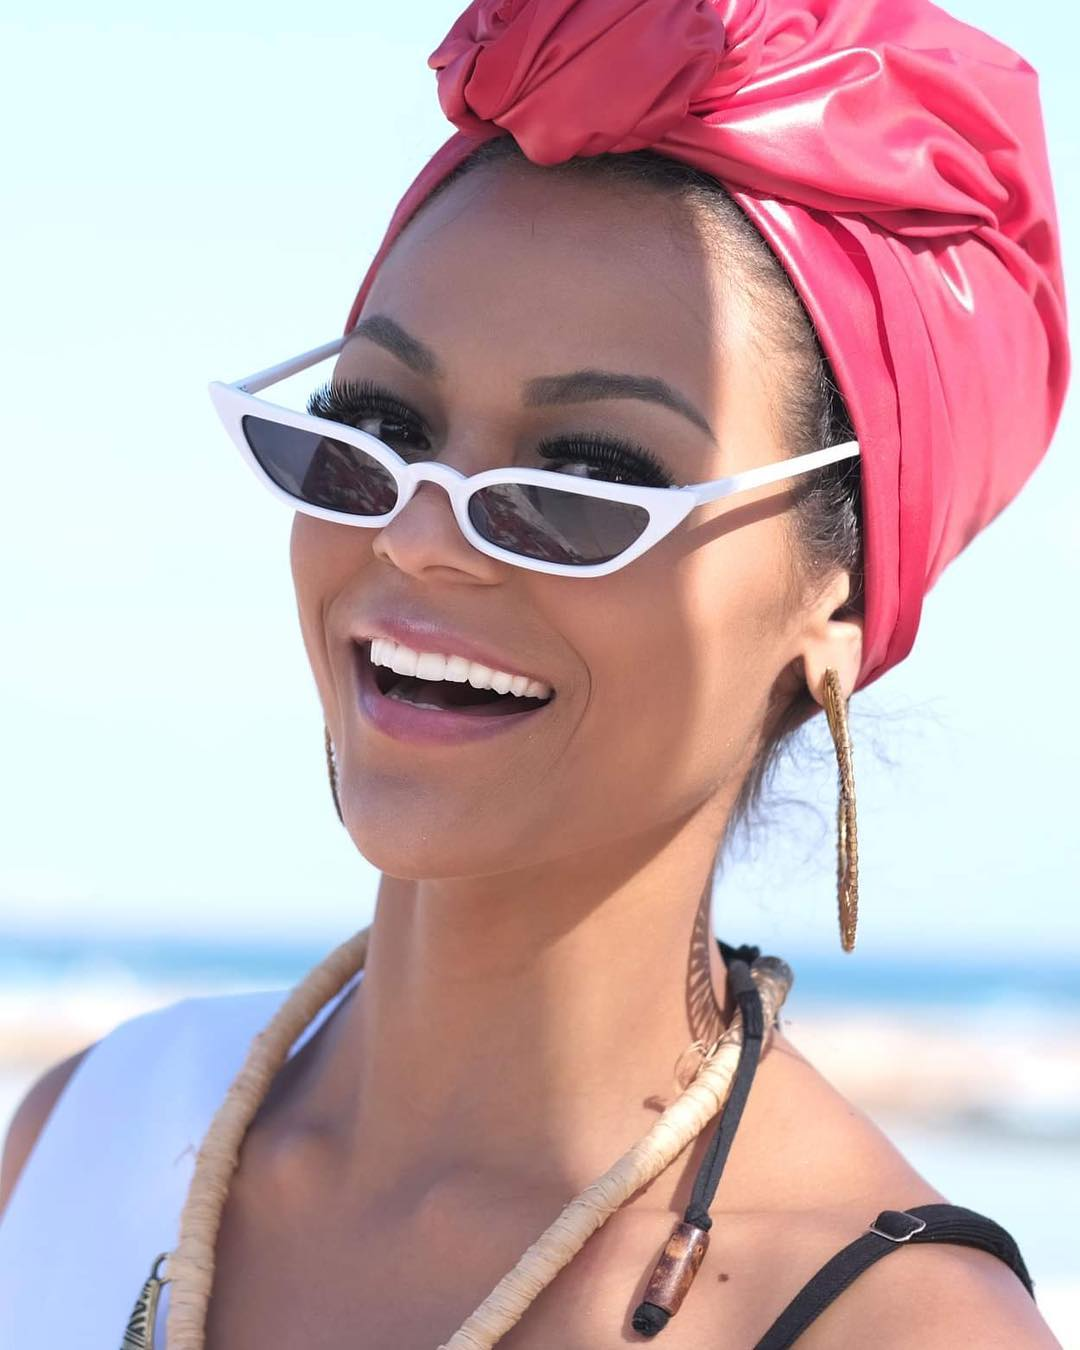 hosana elliot, semifinalista de top model of the world 2018/miss rio de janeiro 2014. - Página 4 Bpmn5d10